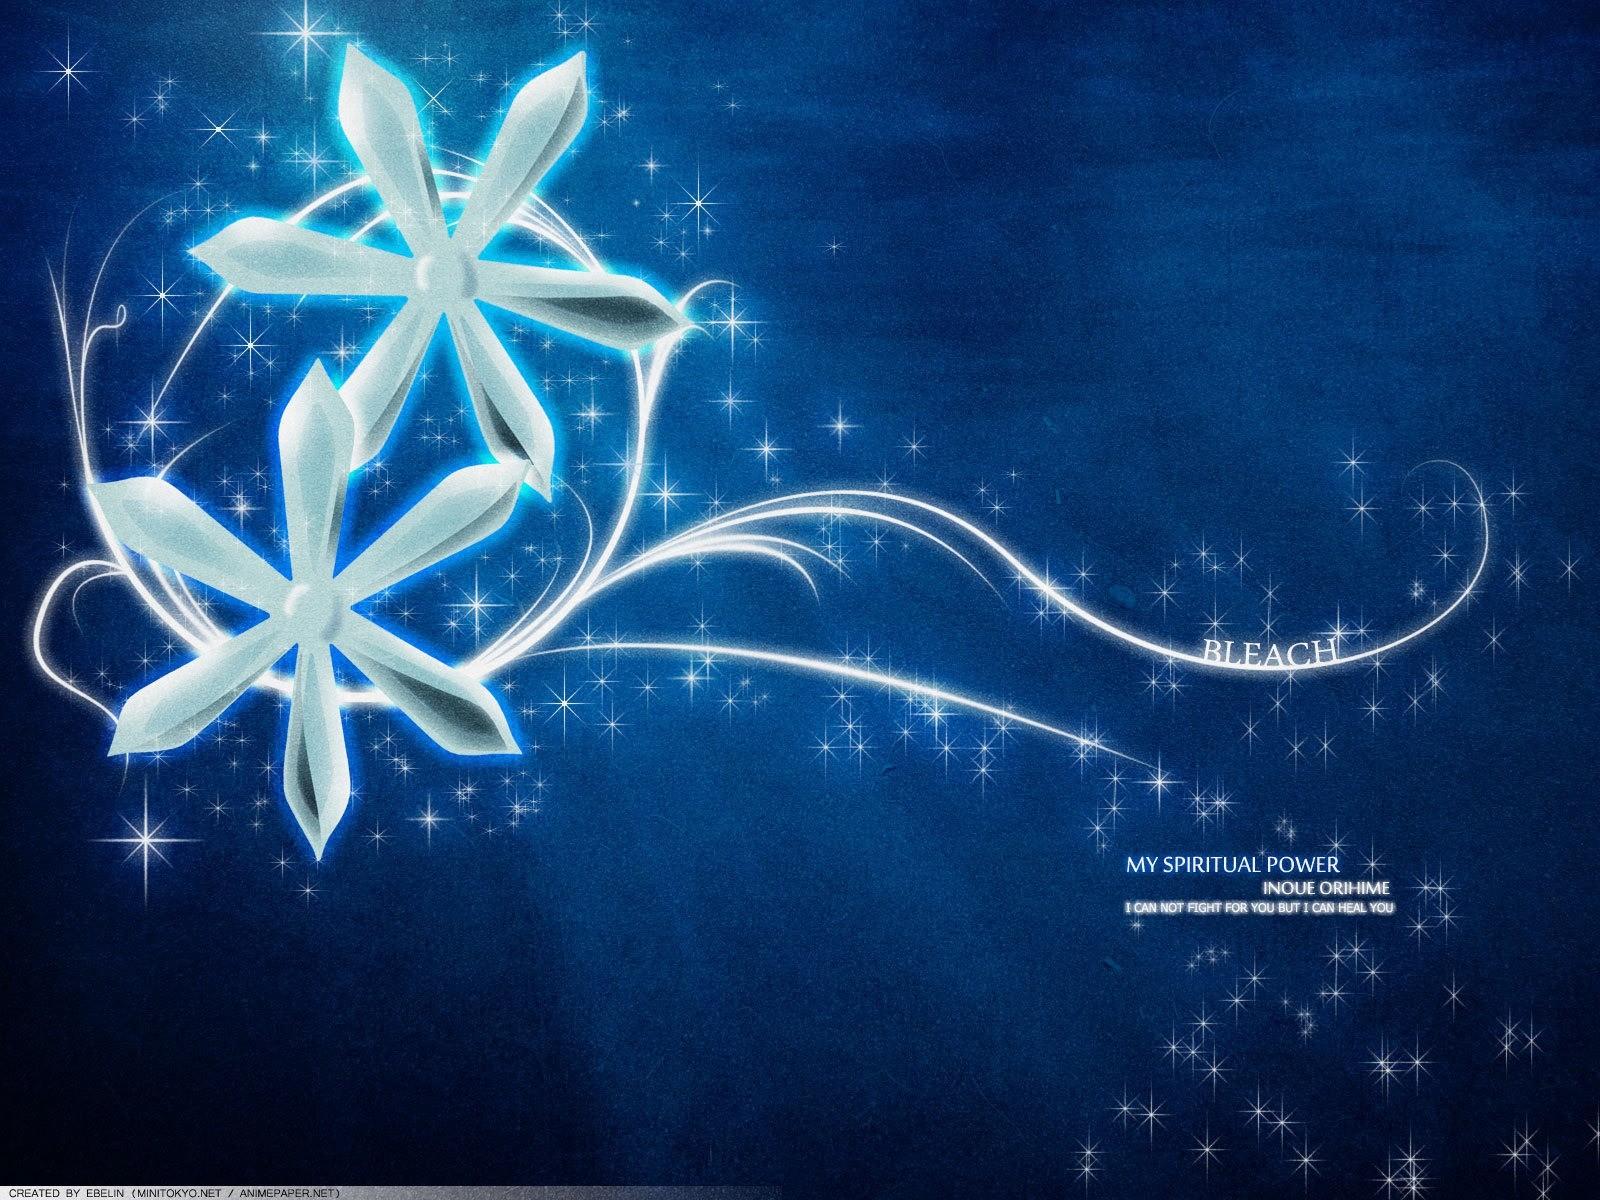 ornaments my spiritual power HD Wallpaper   Anime Manga 966243 1600x1200